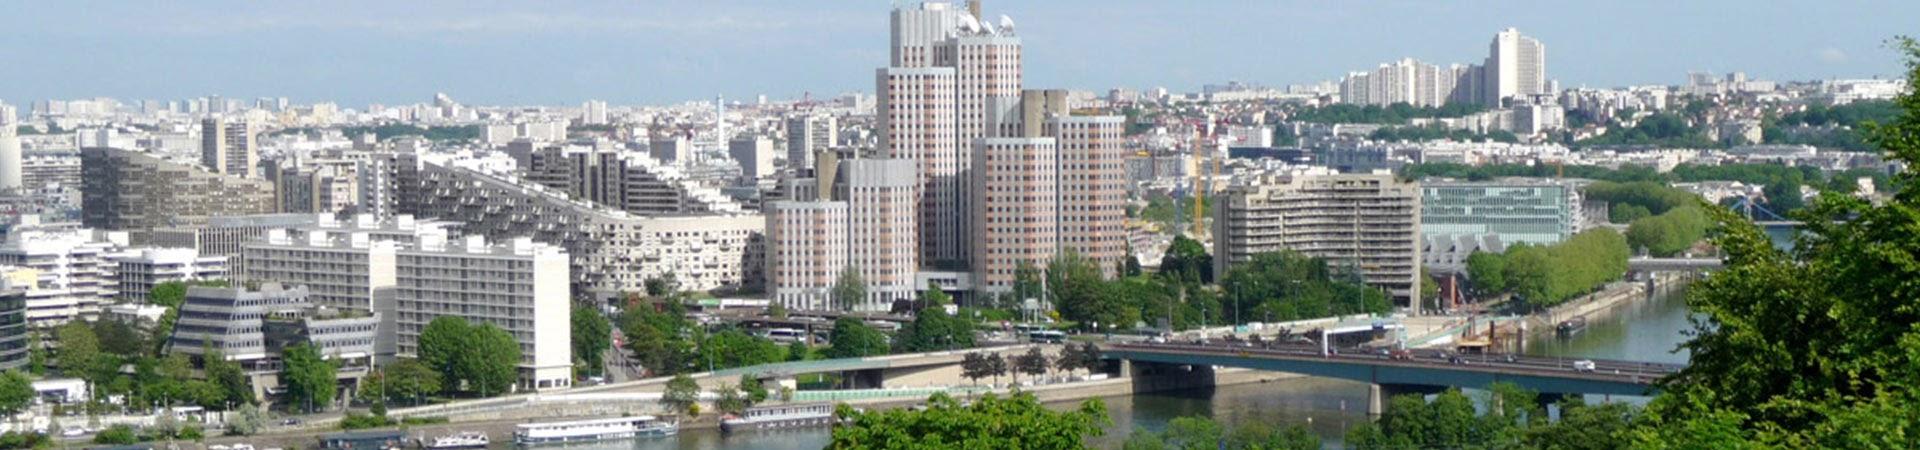 Immobilier Boulogne-Billancourt